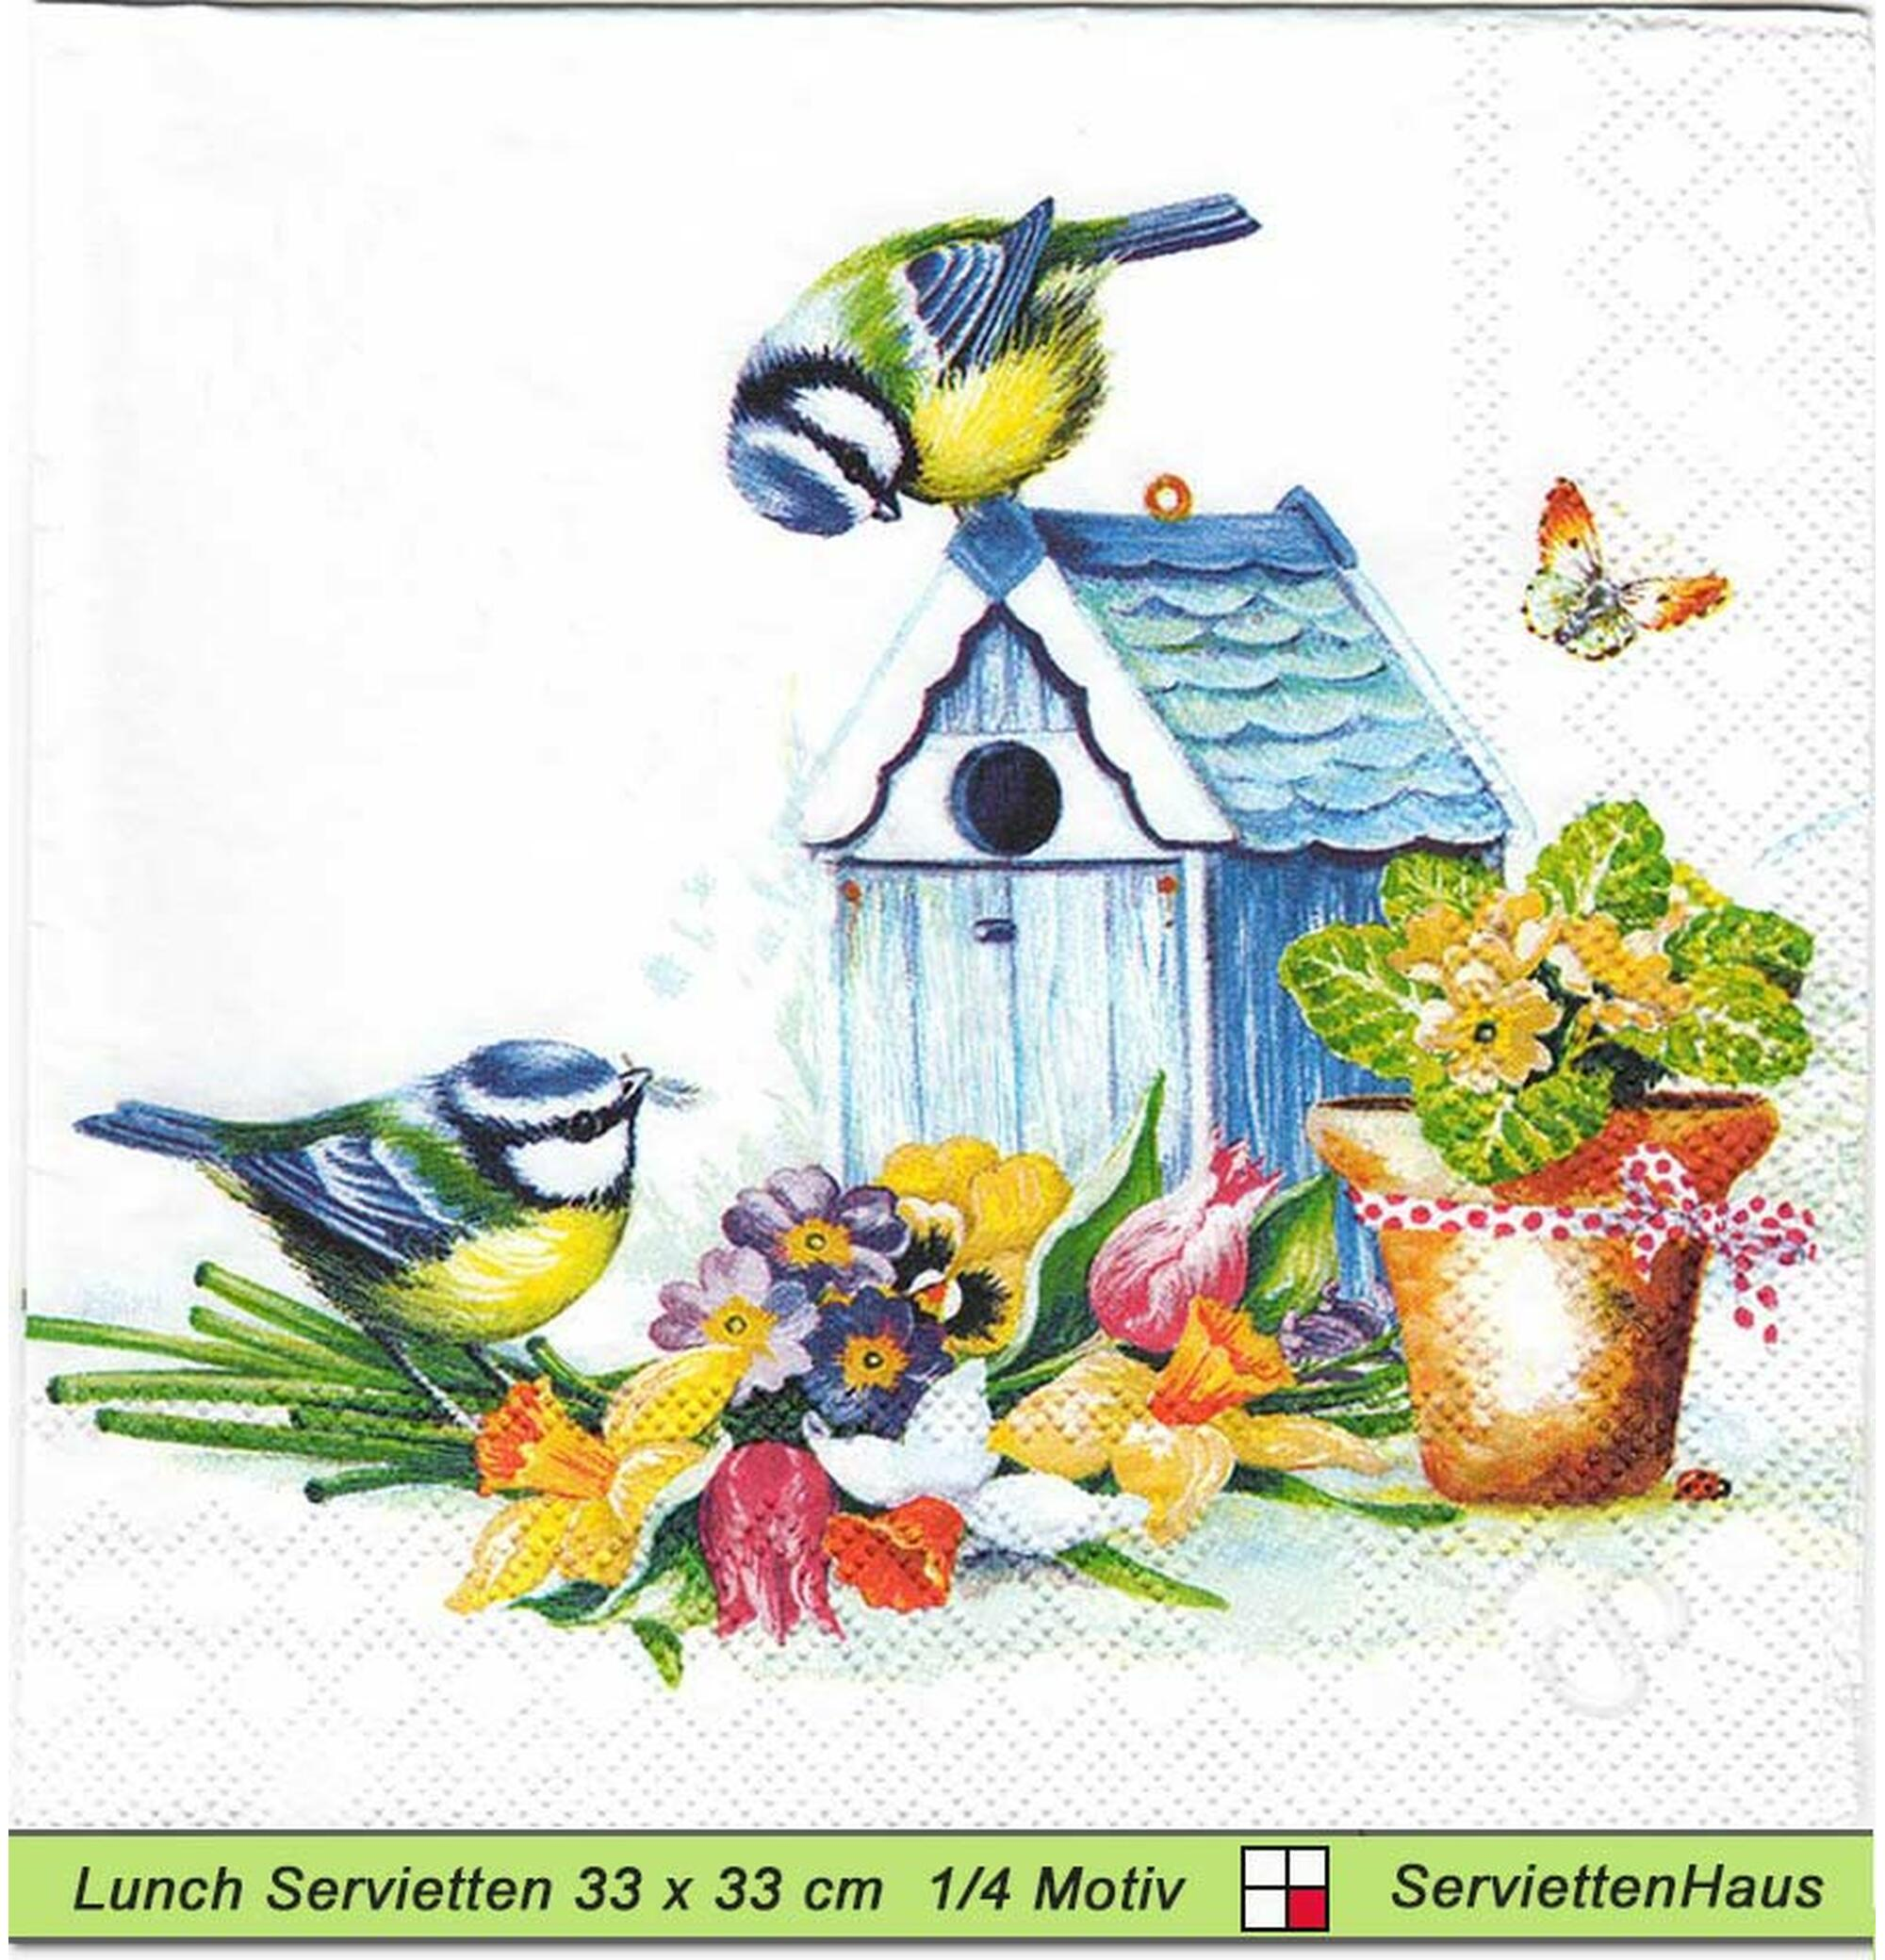 20 Servietten Narzissen Vögel 1 Packung Motivservietten Ambiente Frühling Schmet